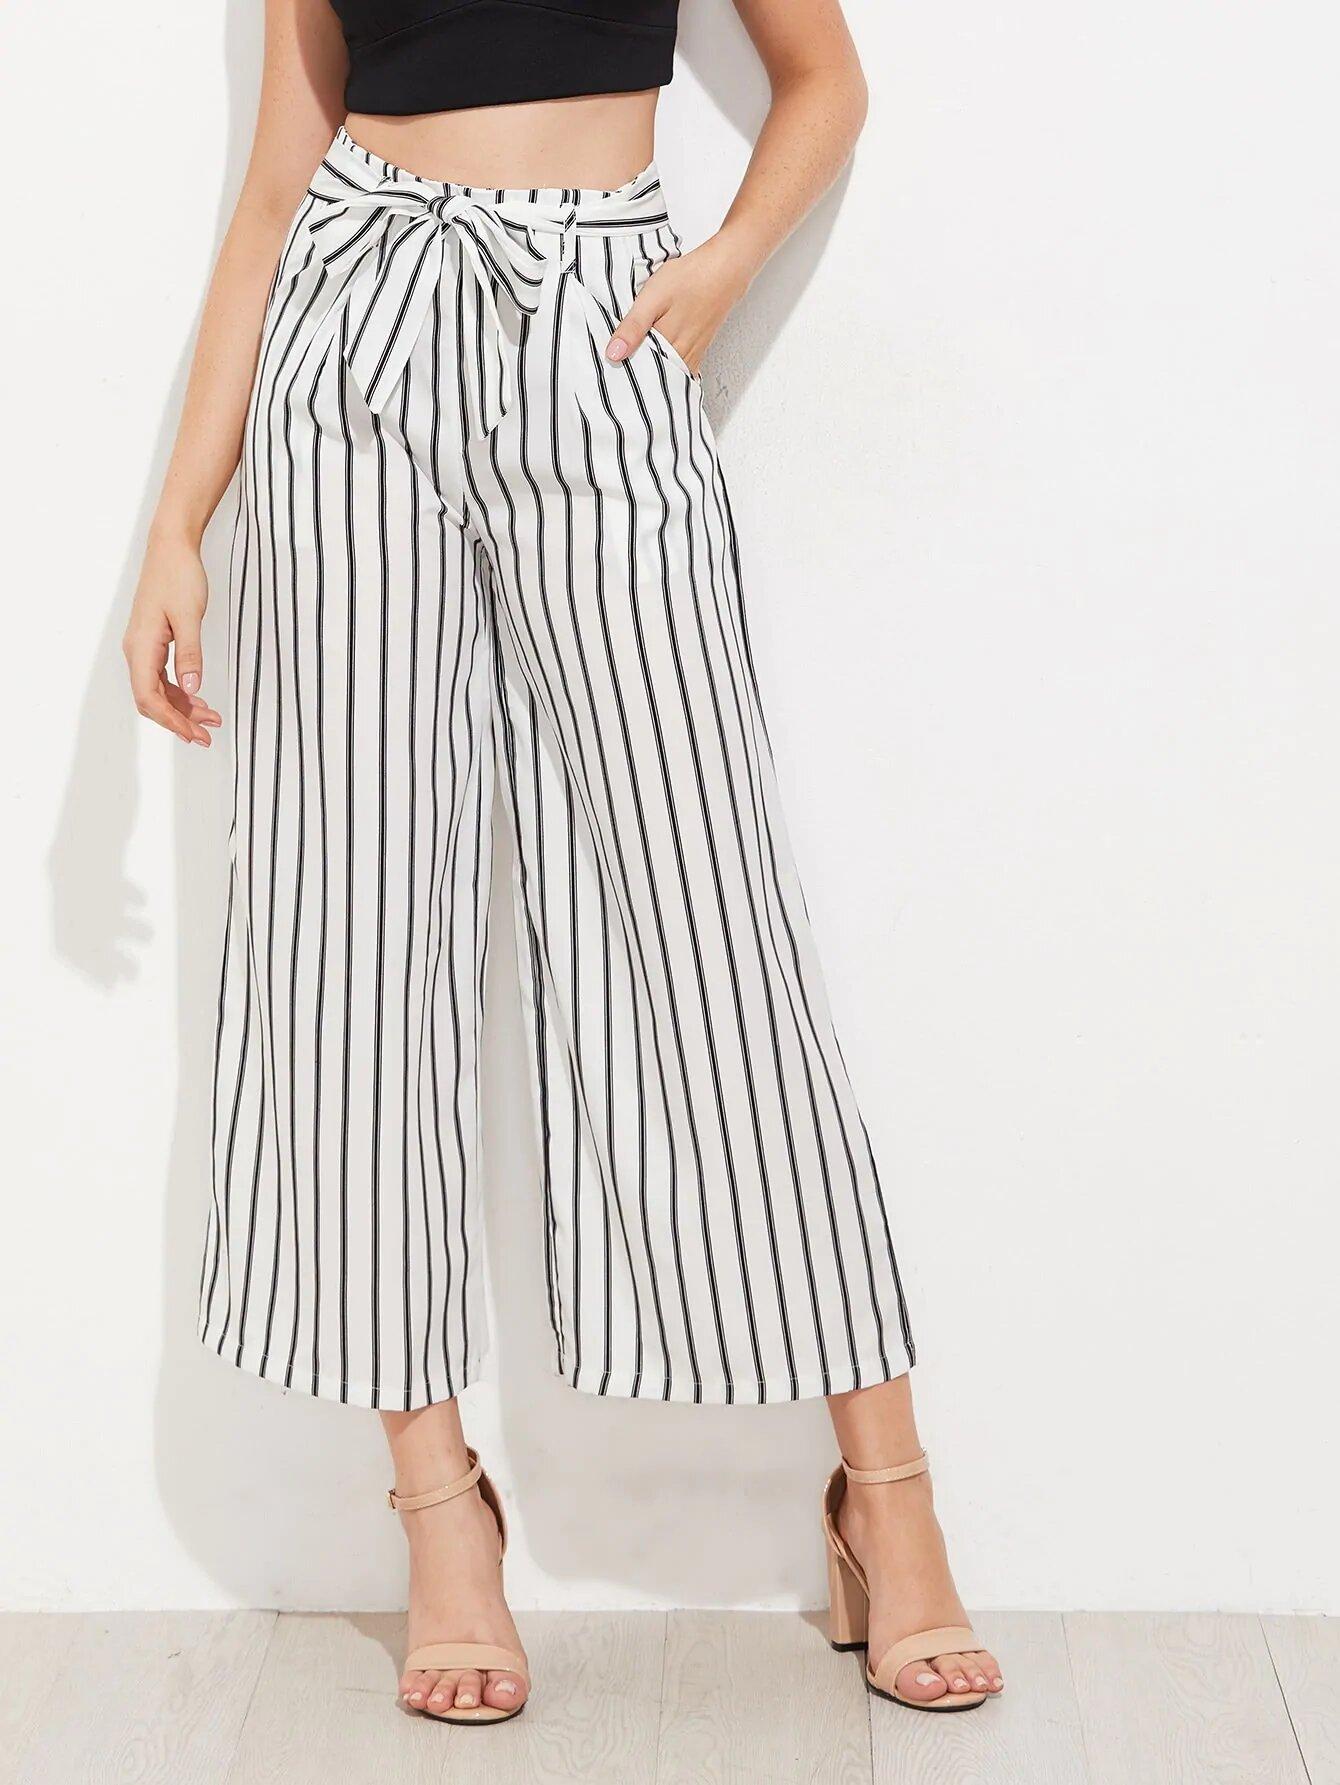 Pantalones de pierna ancha a rayas verticales Pantalones de pierna ancha a  rayas verticales 1 600x799 966e45208e6a